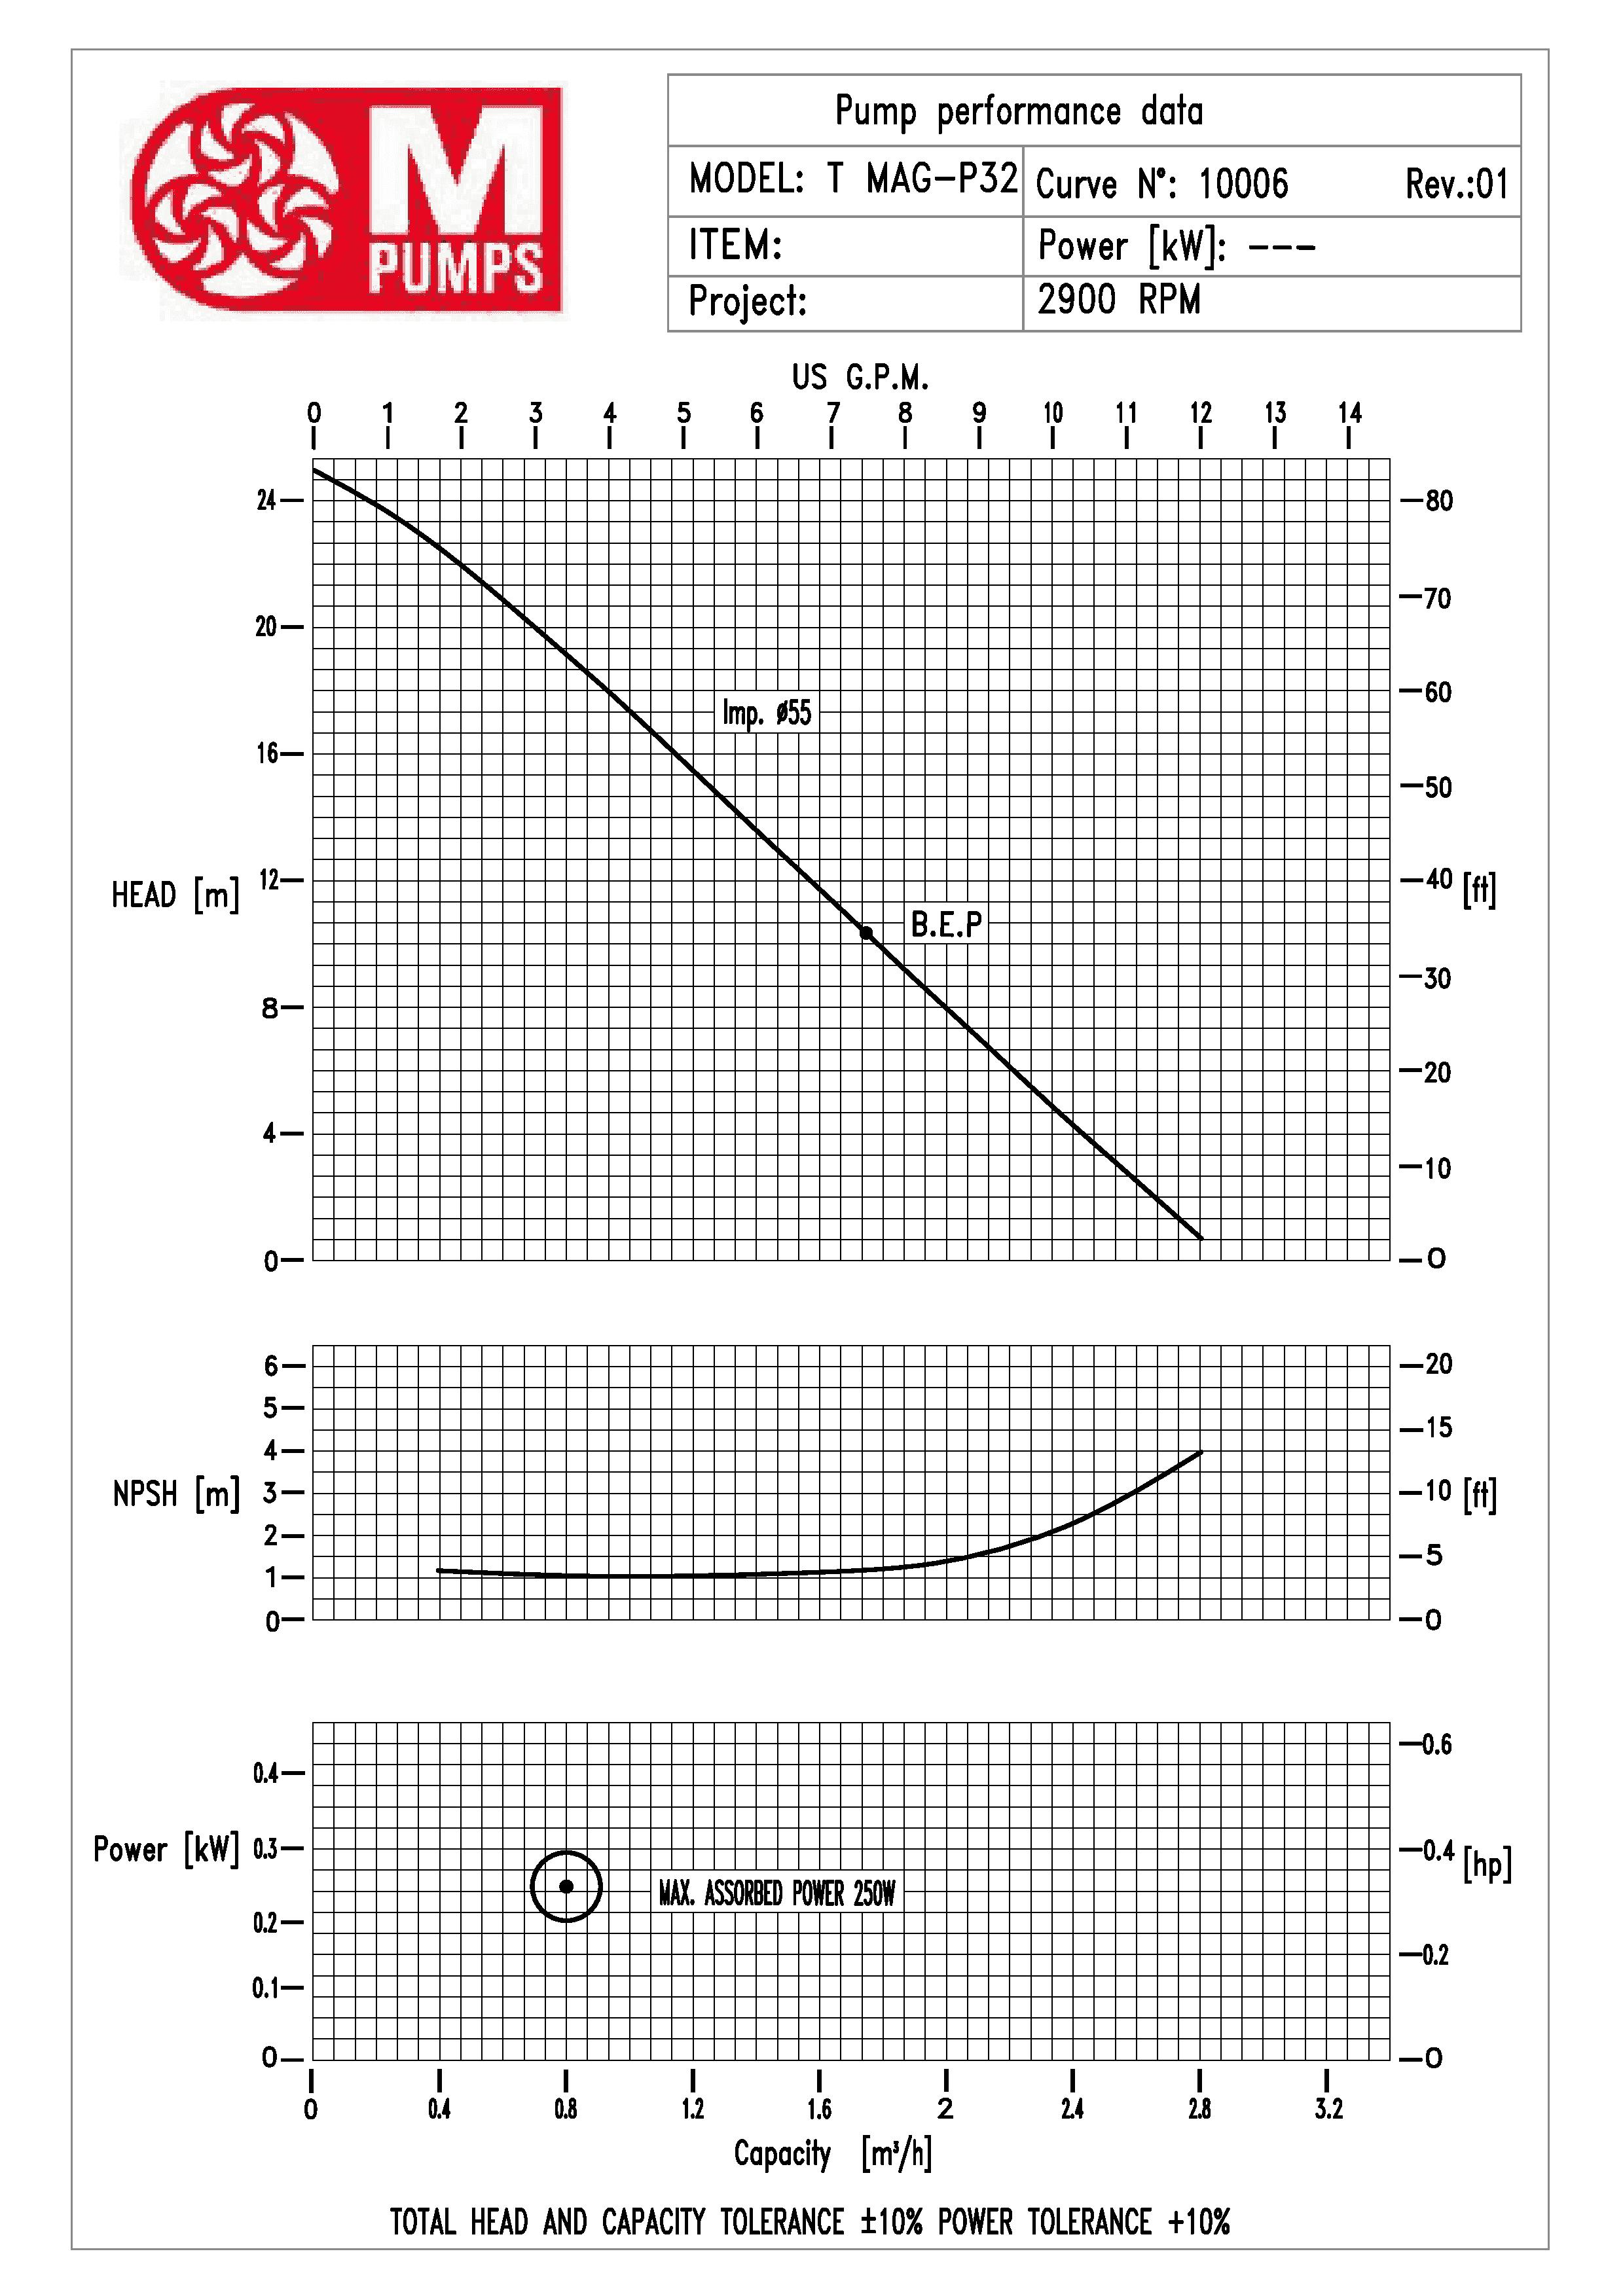 кривая t-mag-p-32